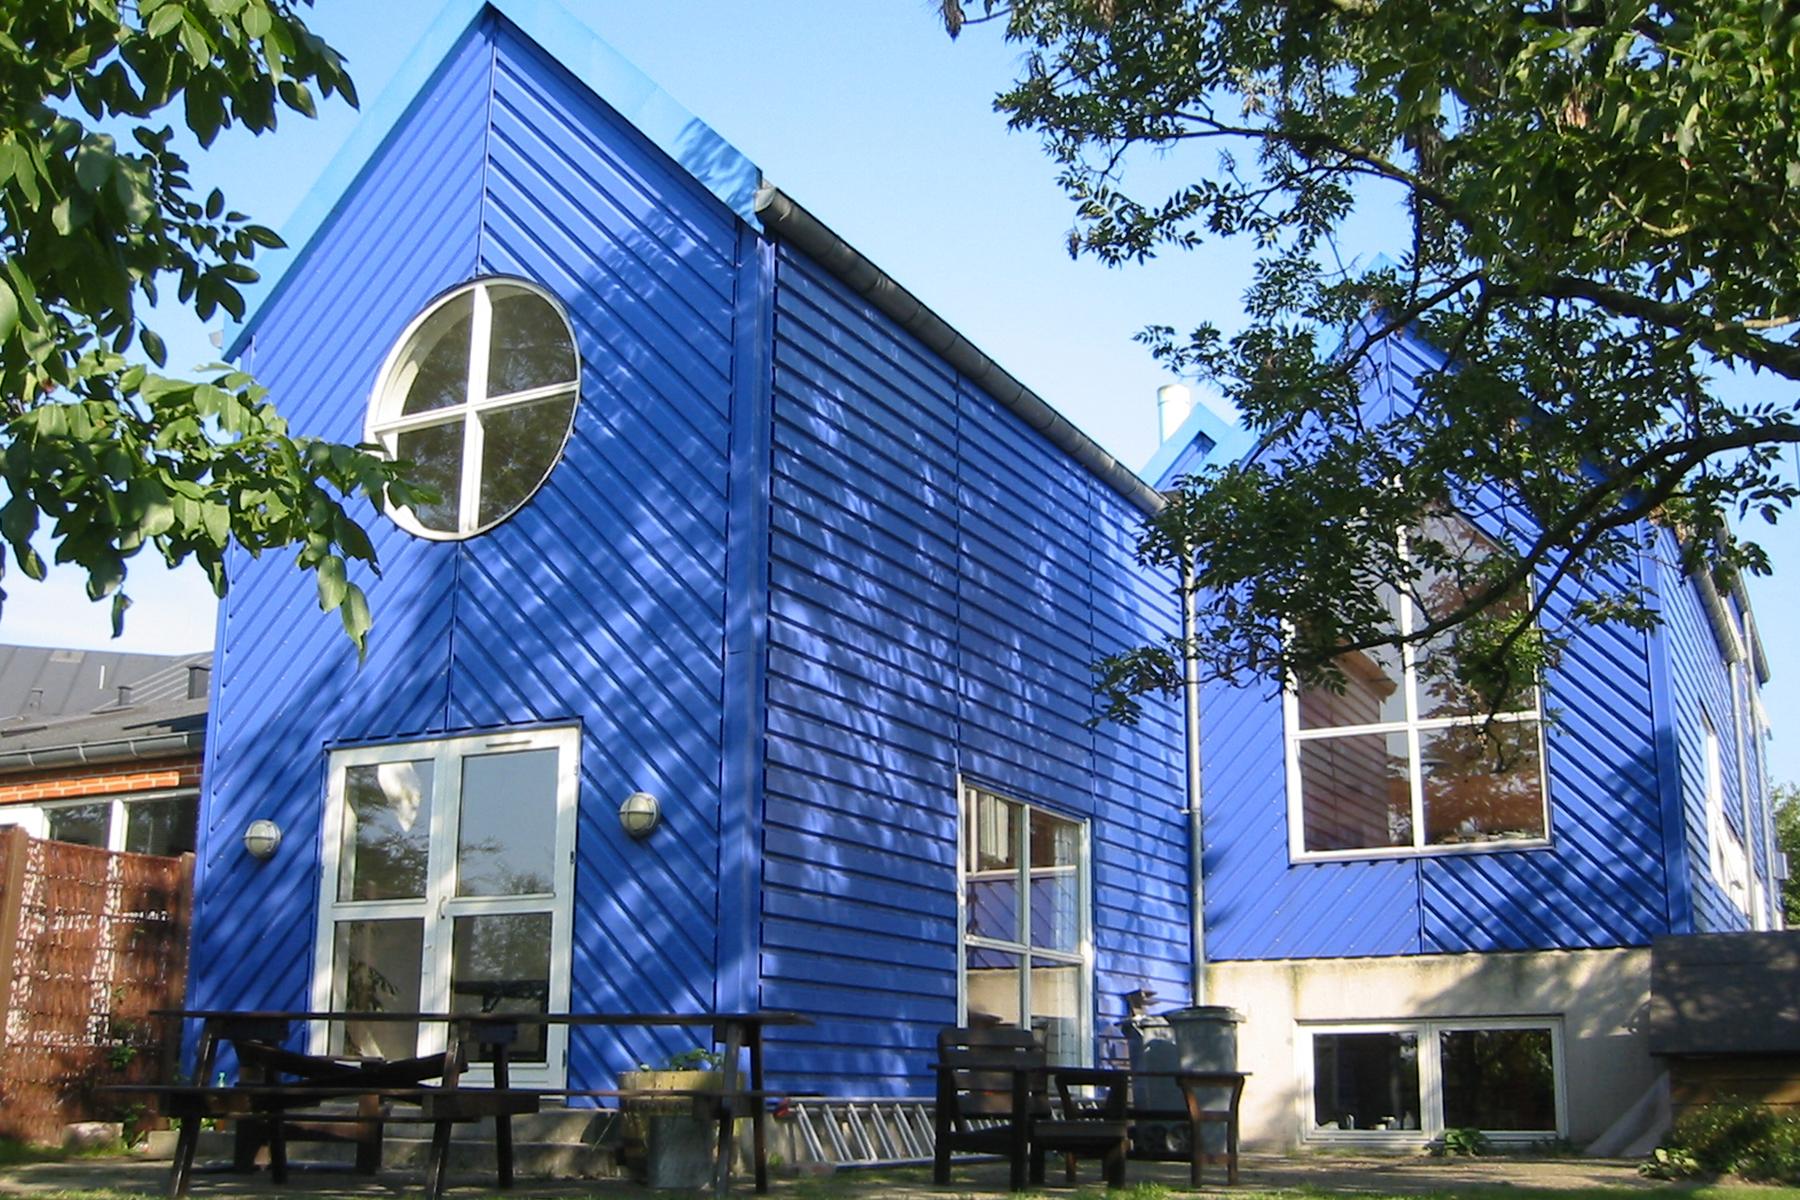 Kilen Cohousing  in Bikerod, DK. Designed by Jan Gudmand Hoyer